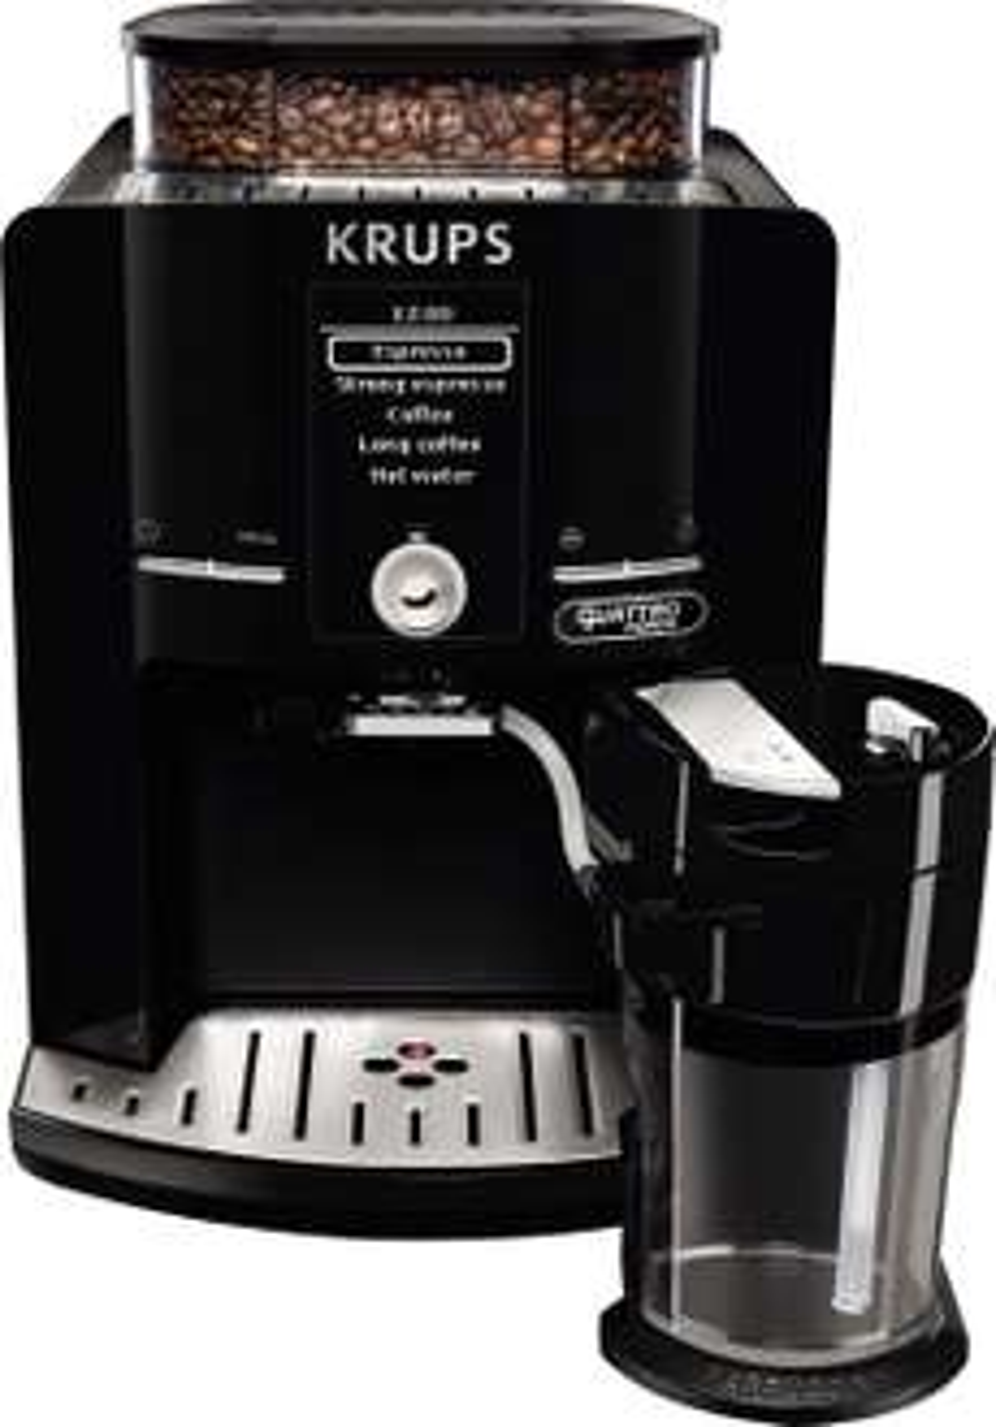 [Amazon Blitzdeal] Krups EA82F8 Kaffeevollautomat Latt'Espress Quattro Force, One-Touch Funktion, Milchbehälter, 1,7 L, 15 bar, schwarz / edelstahl